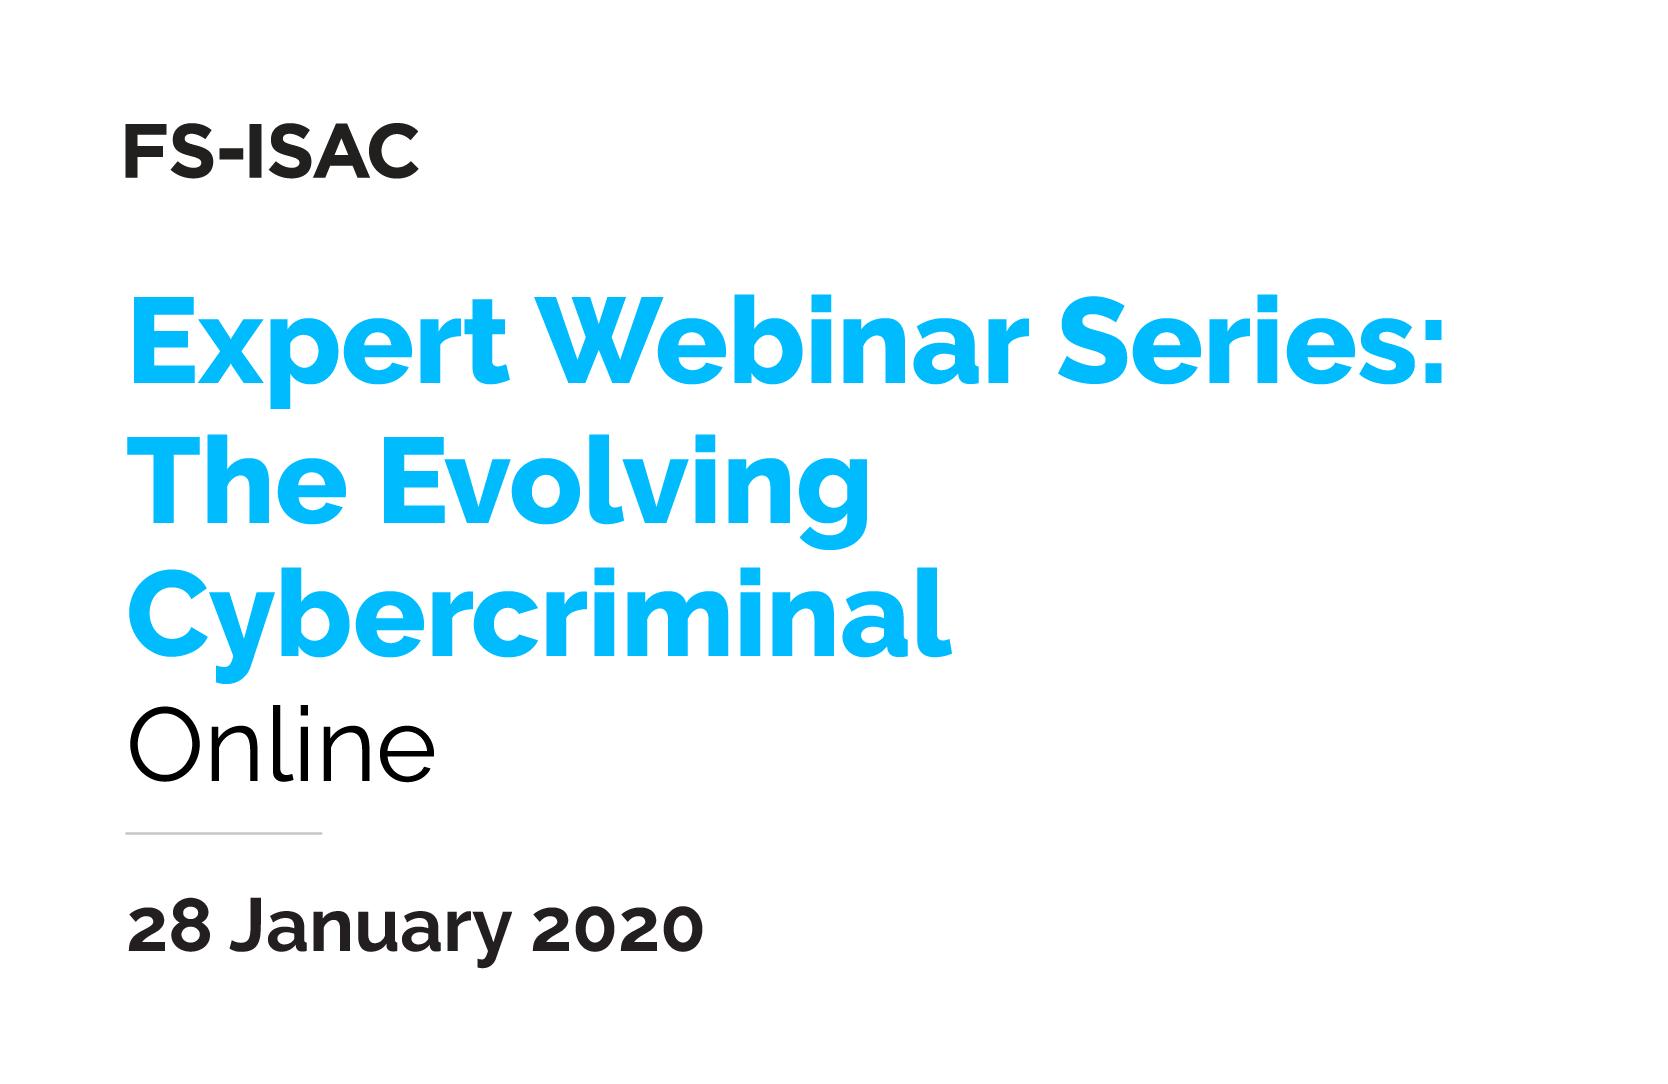 Expert Webinar: The Evolving Cybercriminal